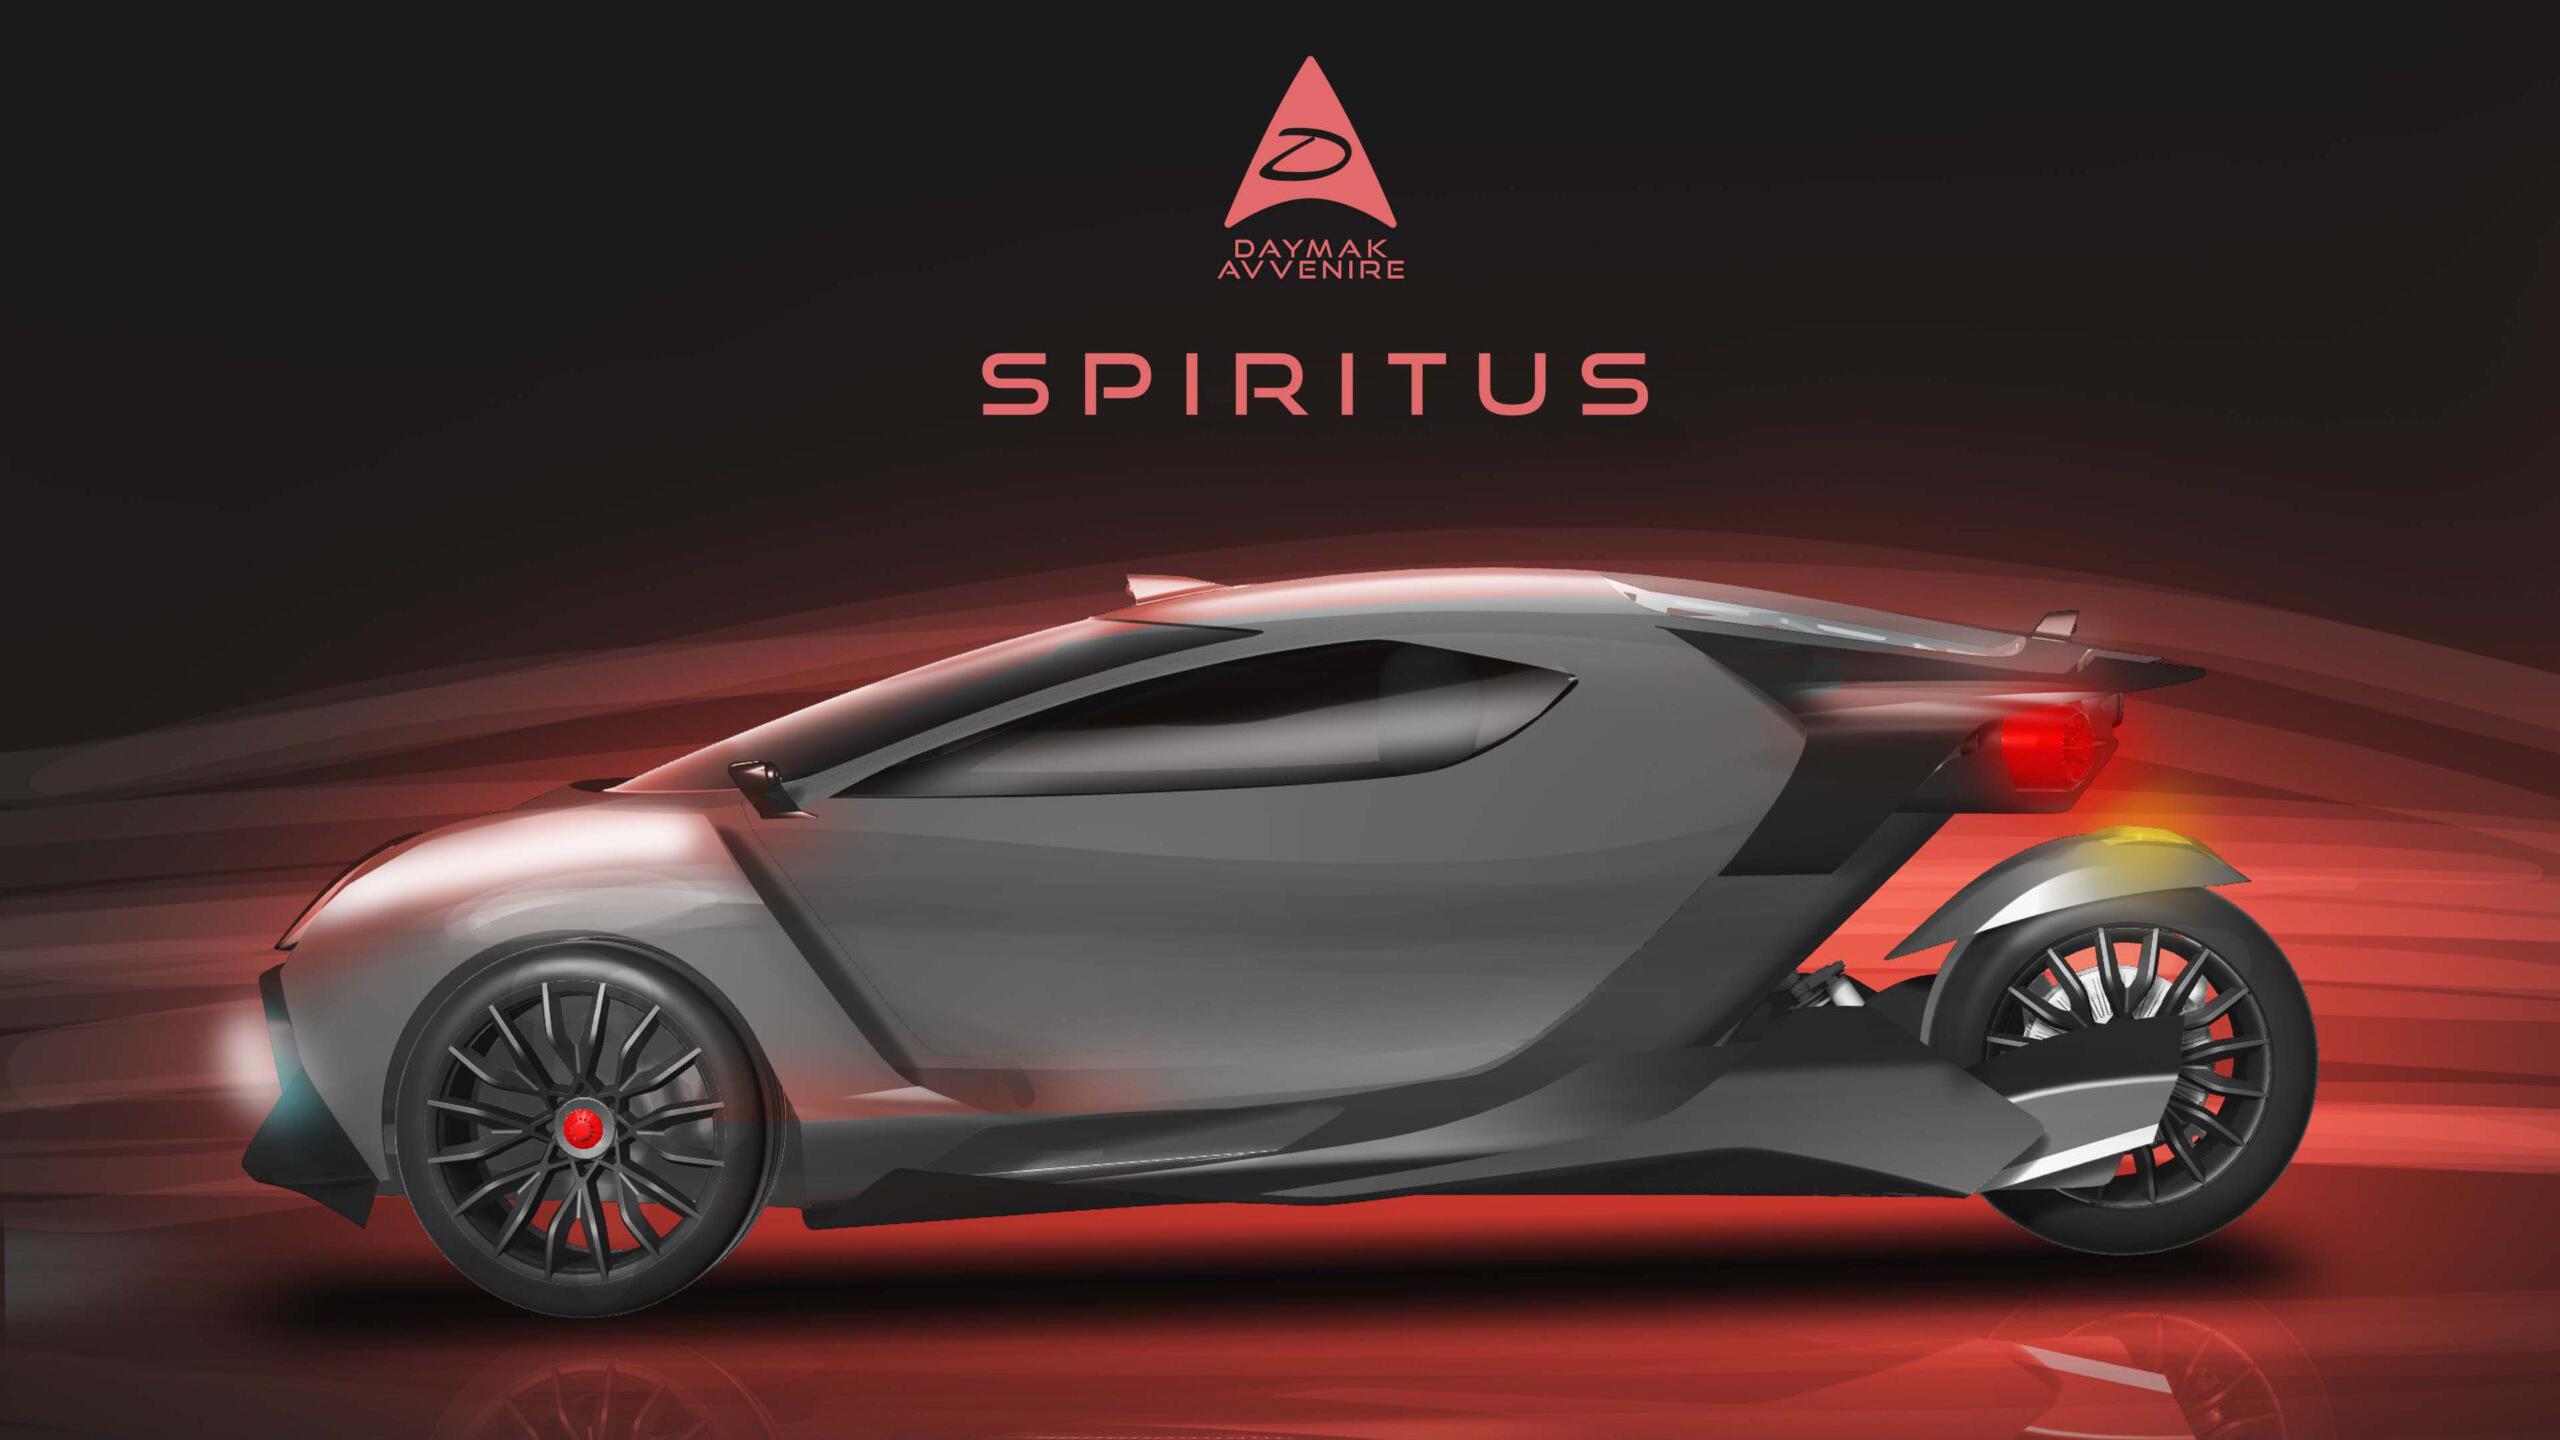 Spiritus electric vehicle